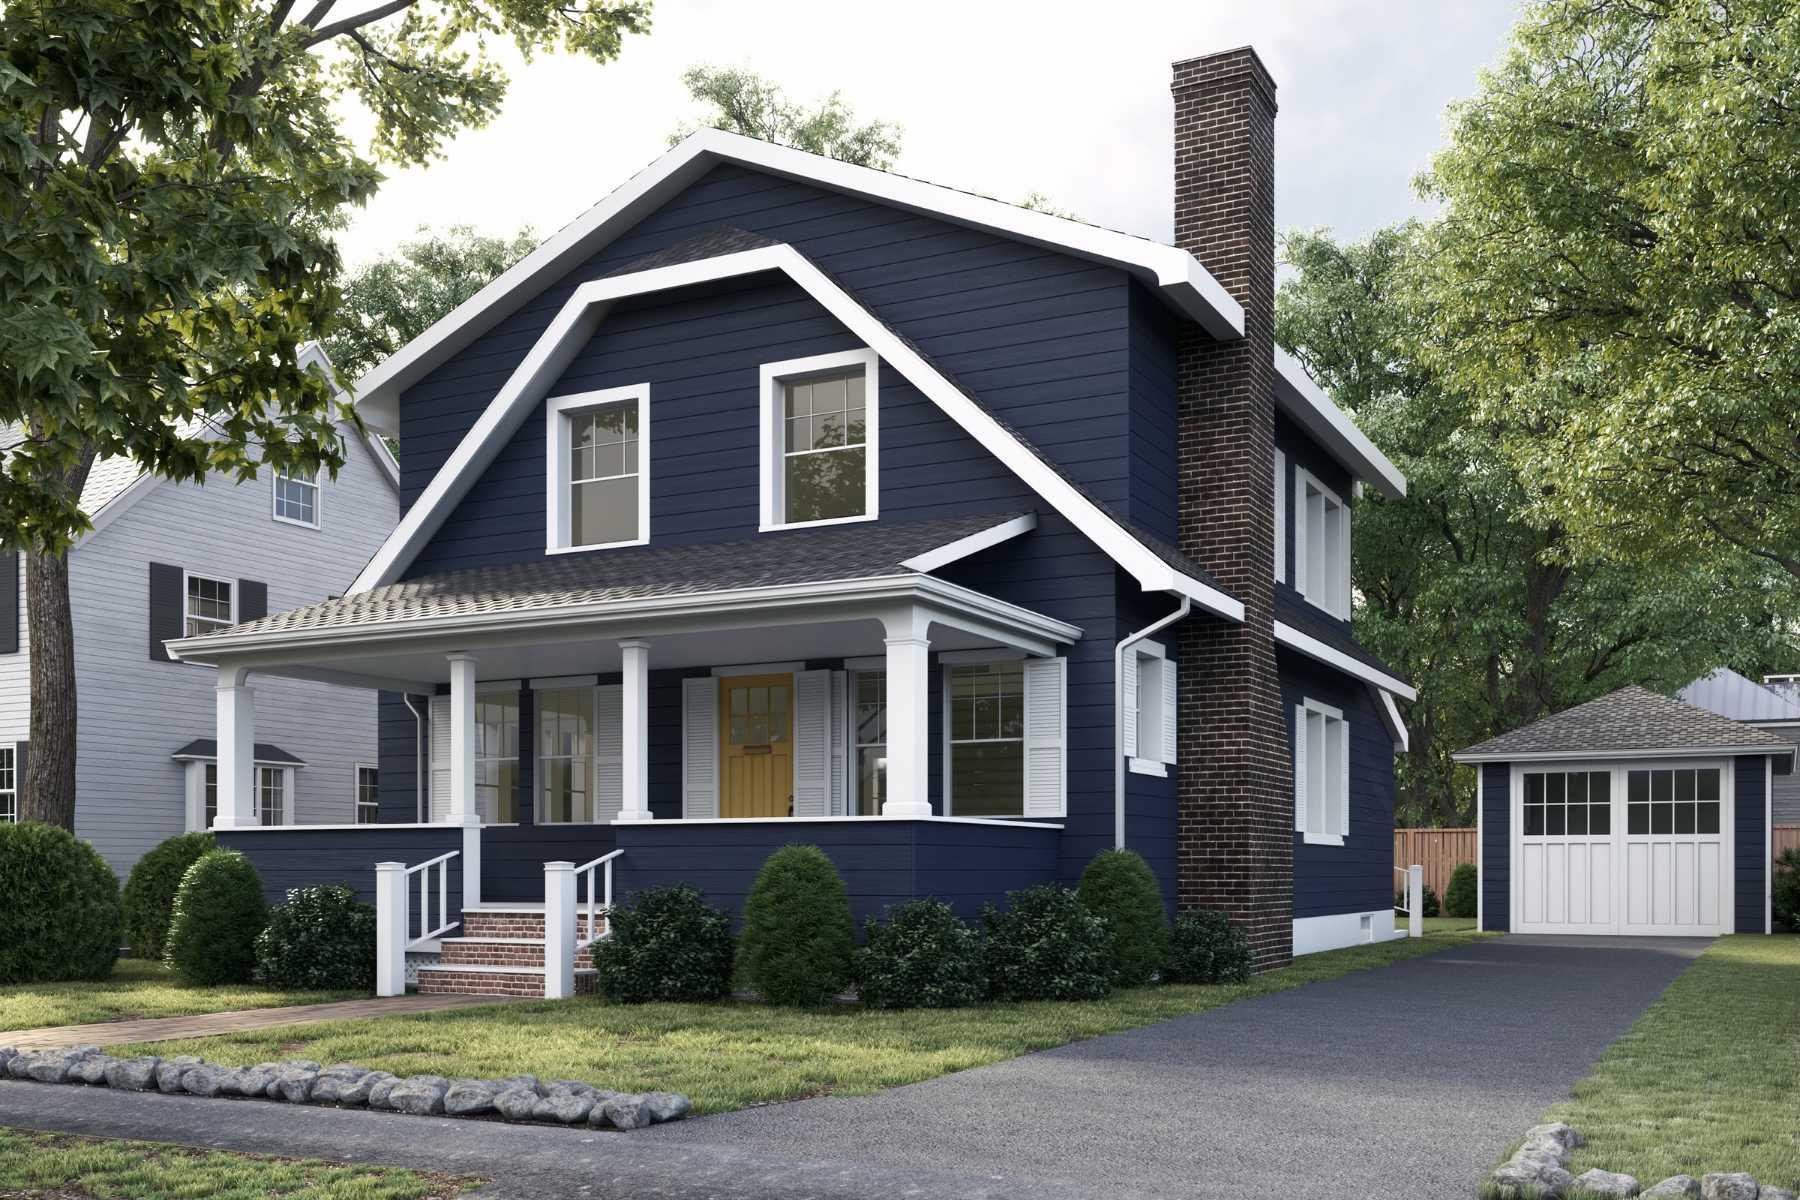 27 Hinckley Road - Gut renovation of single family home near Waban Square, Newton